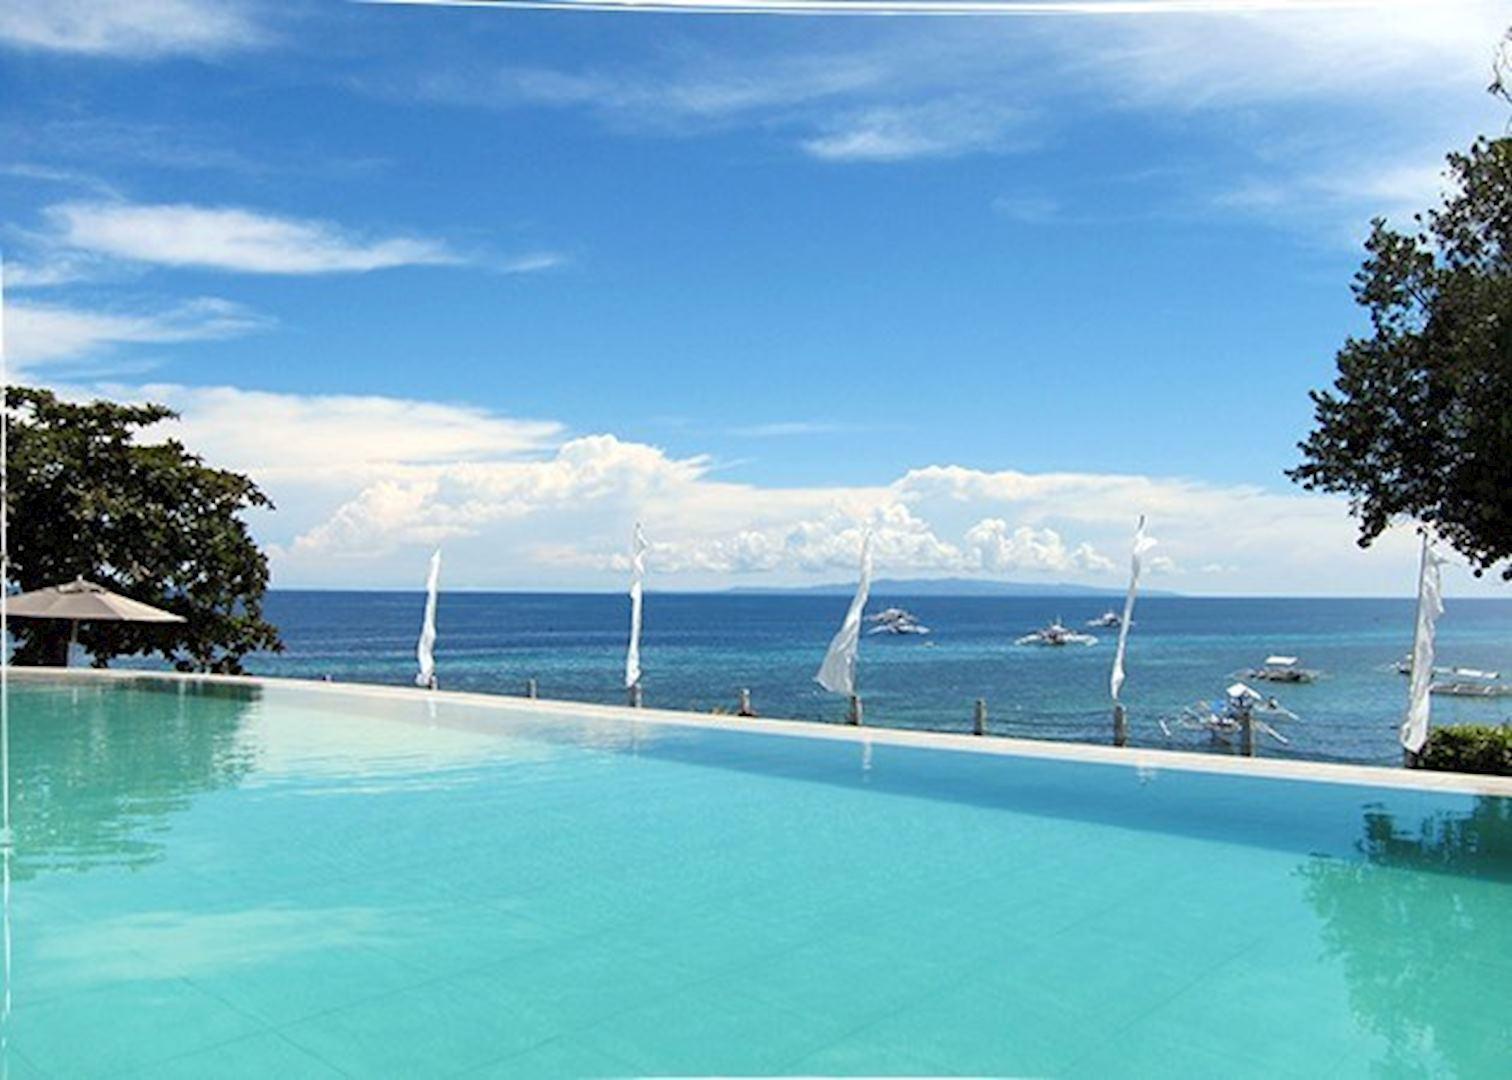 Amorita Resort  Bohol & Panglao Island  Audley Travel. JAL Private Resort Okuma. Drava Hotel Thermal Resort. Delfina Beach Hotel. Aurea Sporting Village Hotel. Rydges Eagle Hawk Resort. Camino Real Hotel. Du Golf Hotel Barriere. Hotel Royal Gardens